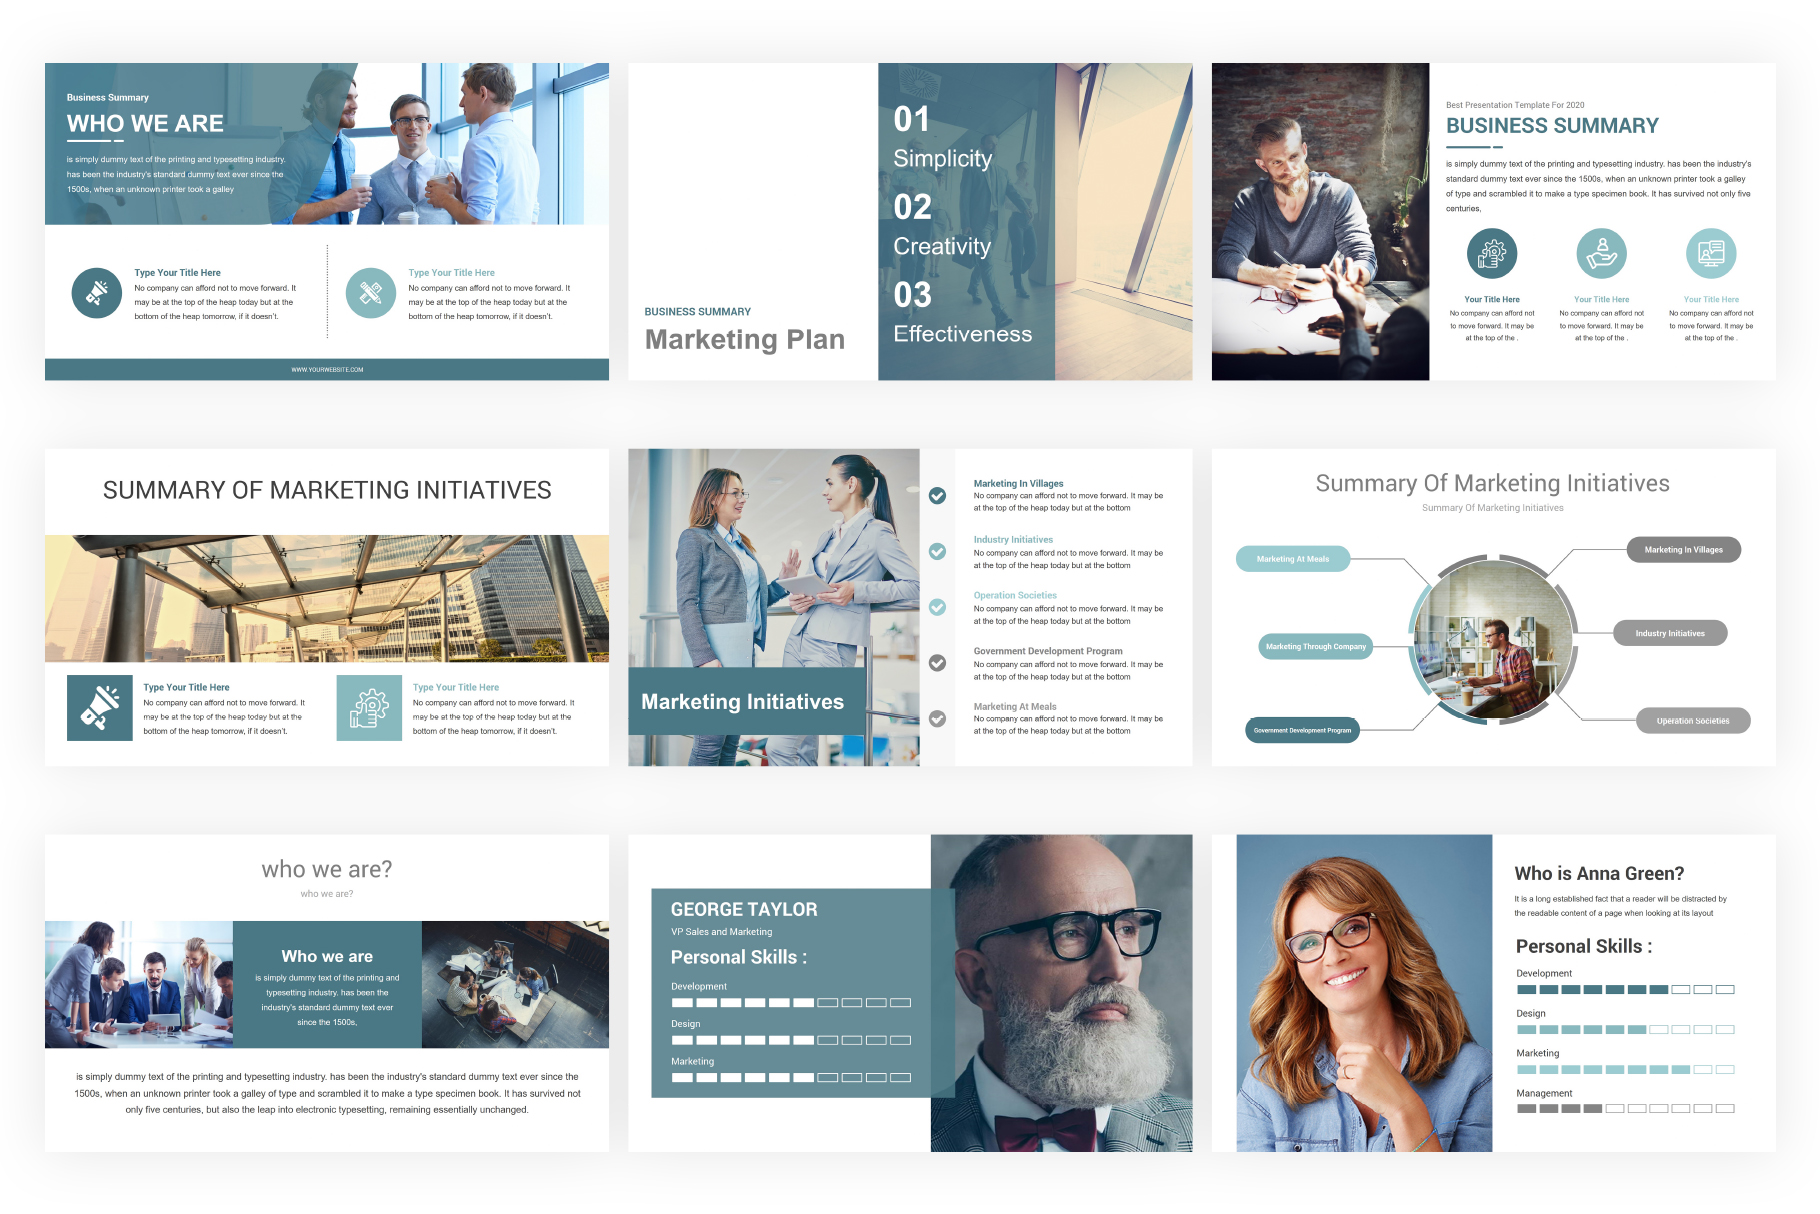 Marketing Plan PowerPoint Presentation Template example image 3